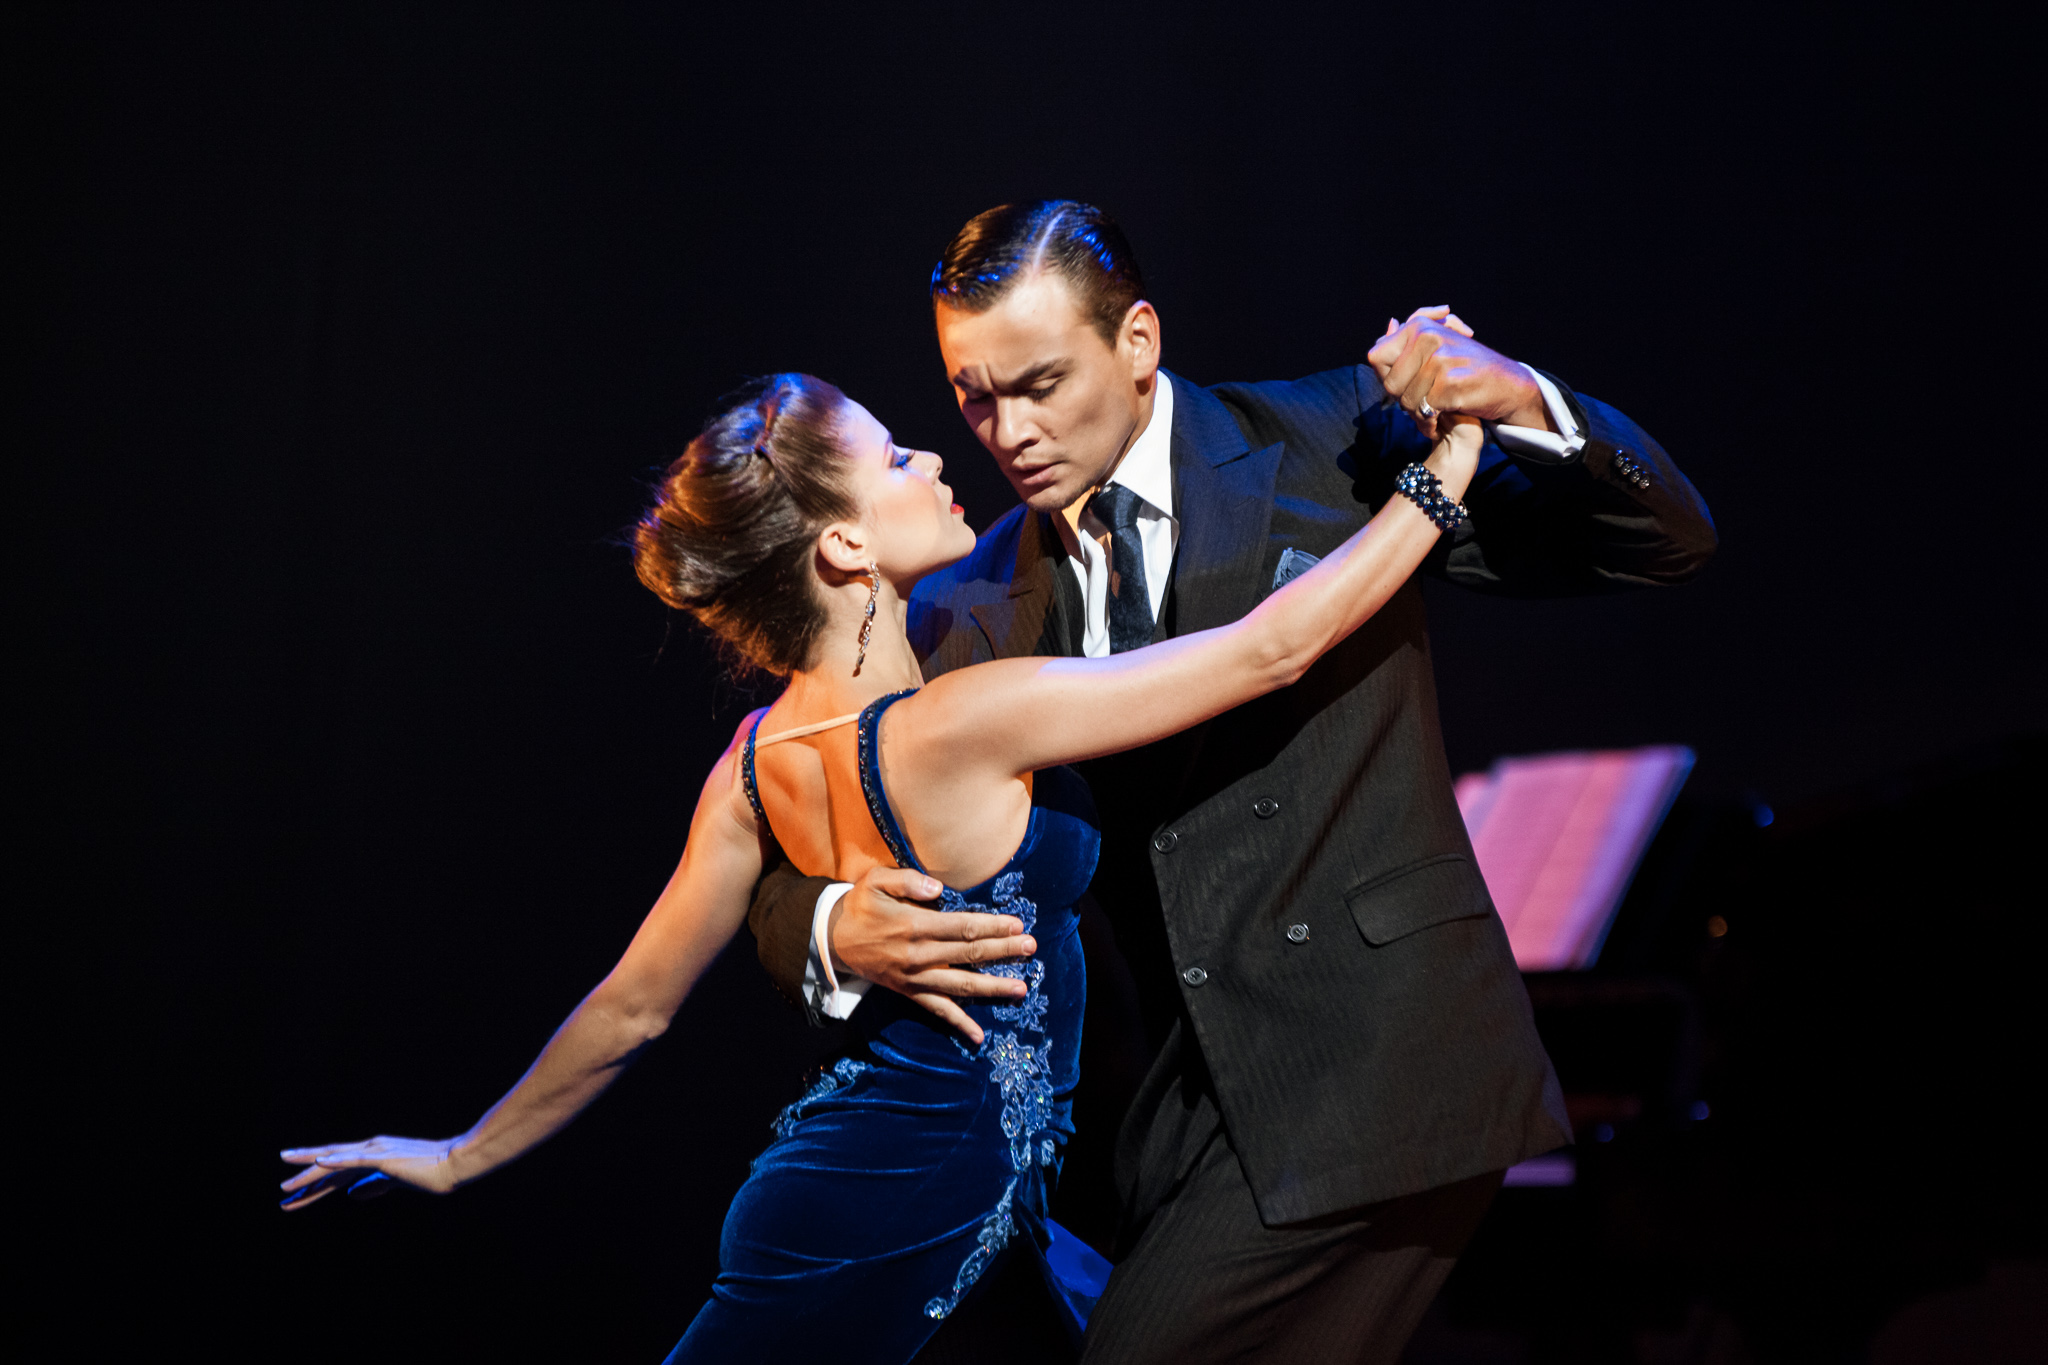 image of Tango Fire - German Cornejo & Gisela Galeassi dance photography, fotografia de escena, fotografo de danza, dance photographer, stage photography